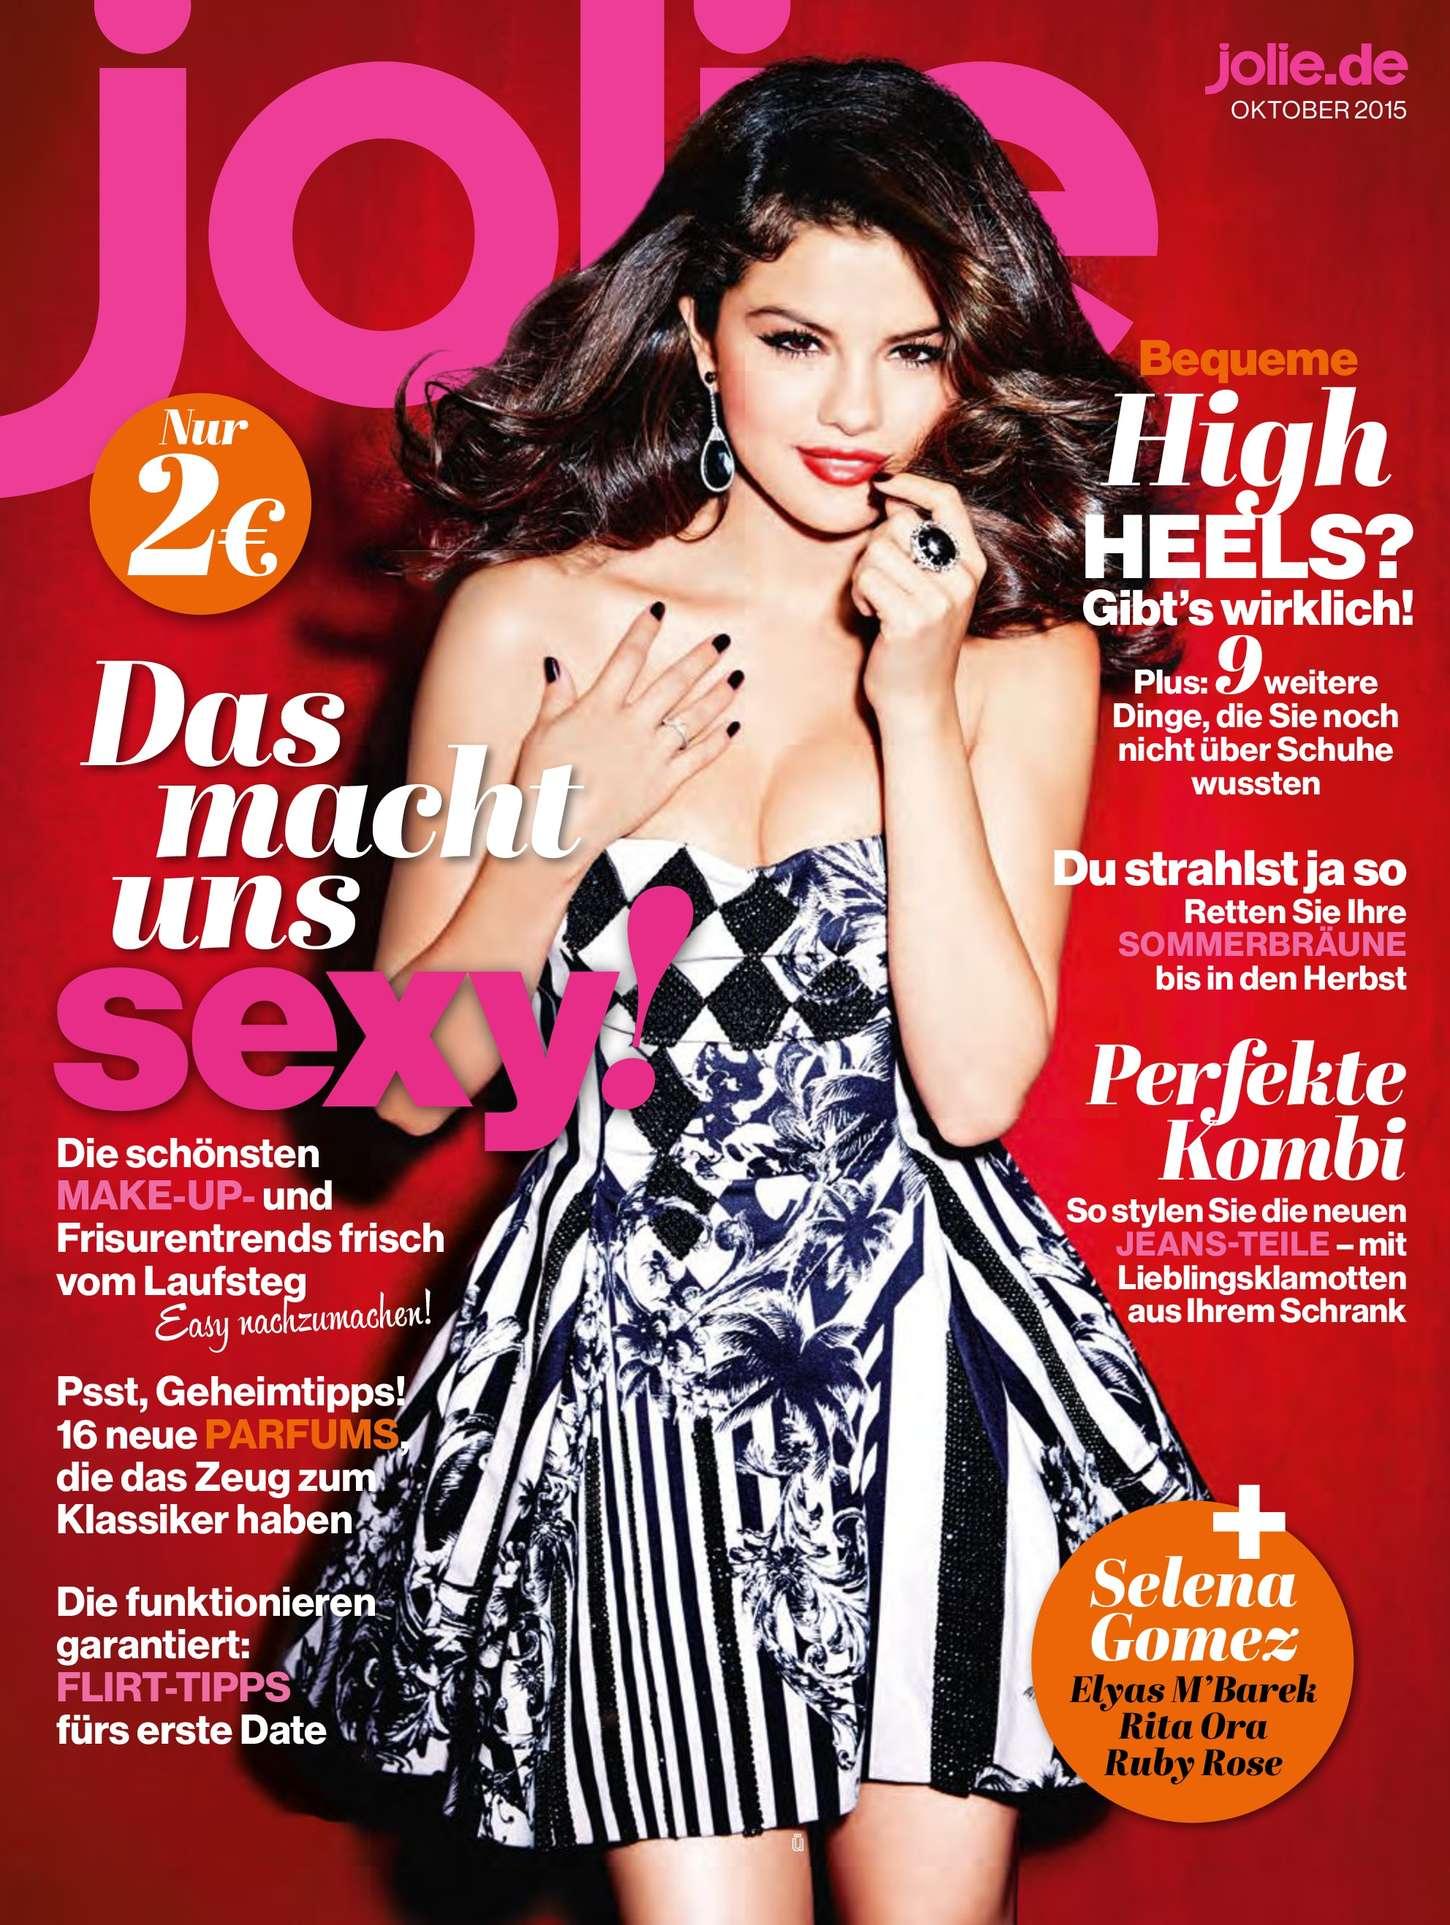 Jolie Magazine November 2017 Issue: Selena Gomez – Jolie Magazine (October 2015)